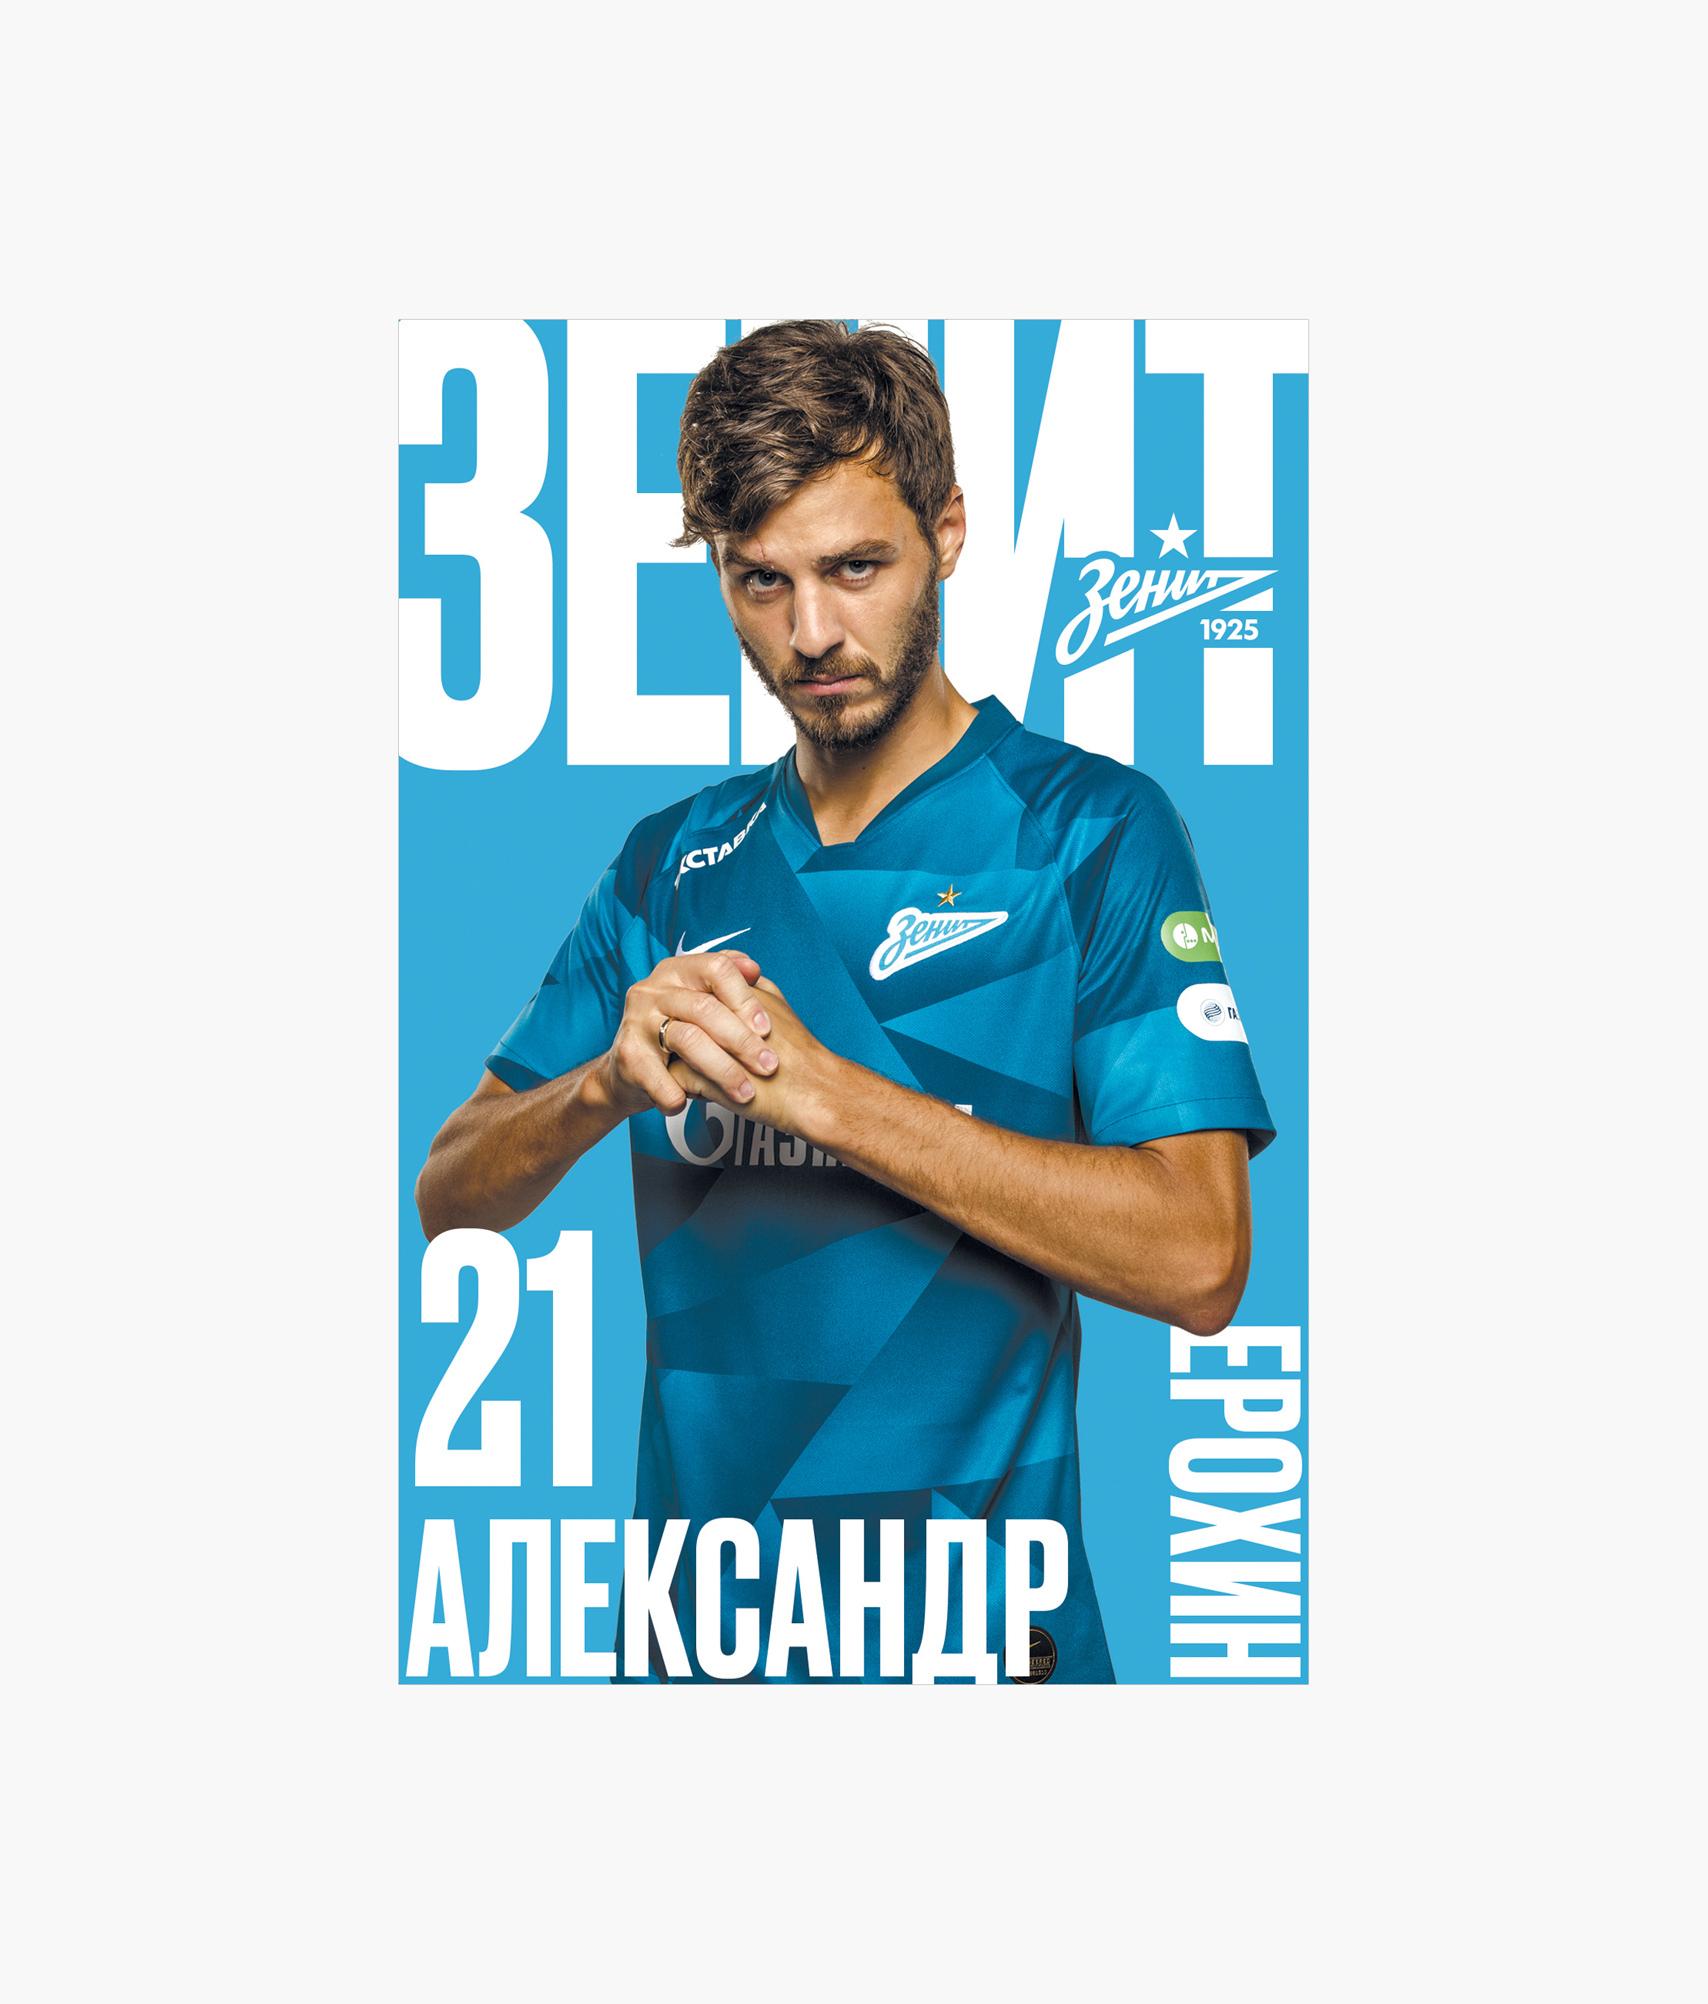 Открытка «Ерохин 2019/2020» Зенит открытка лодыгин 2018 2019 зенит